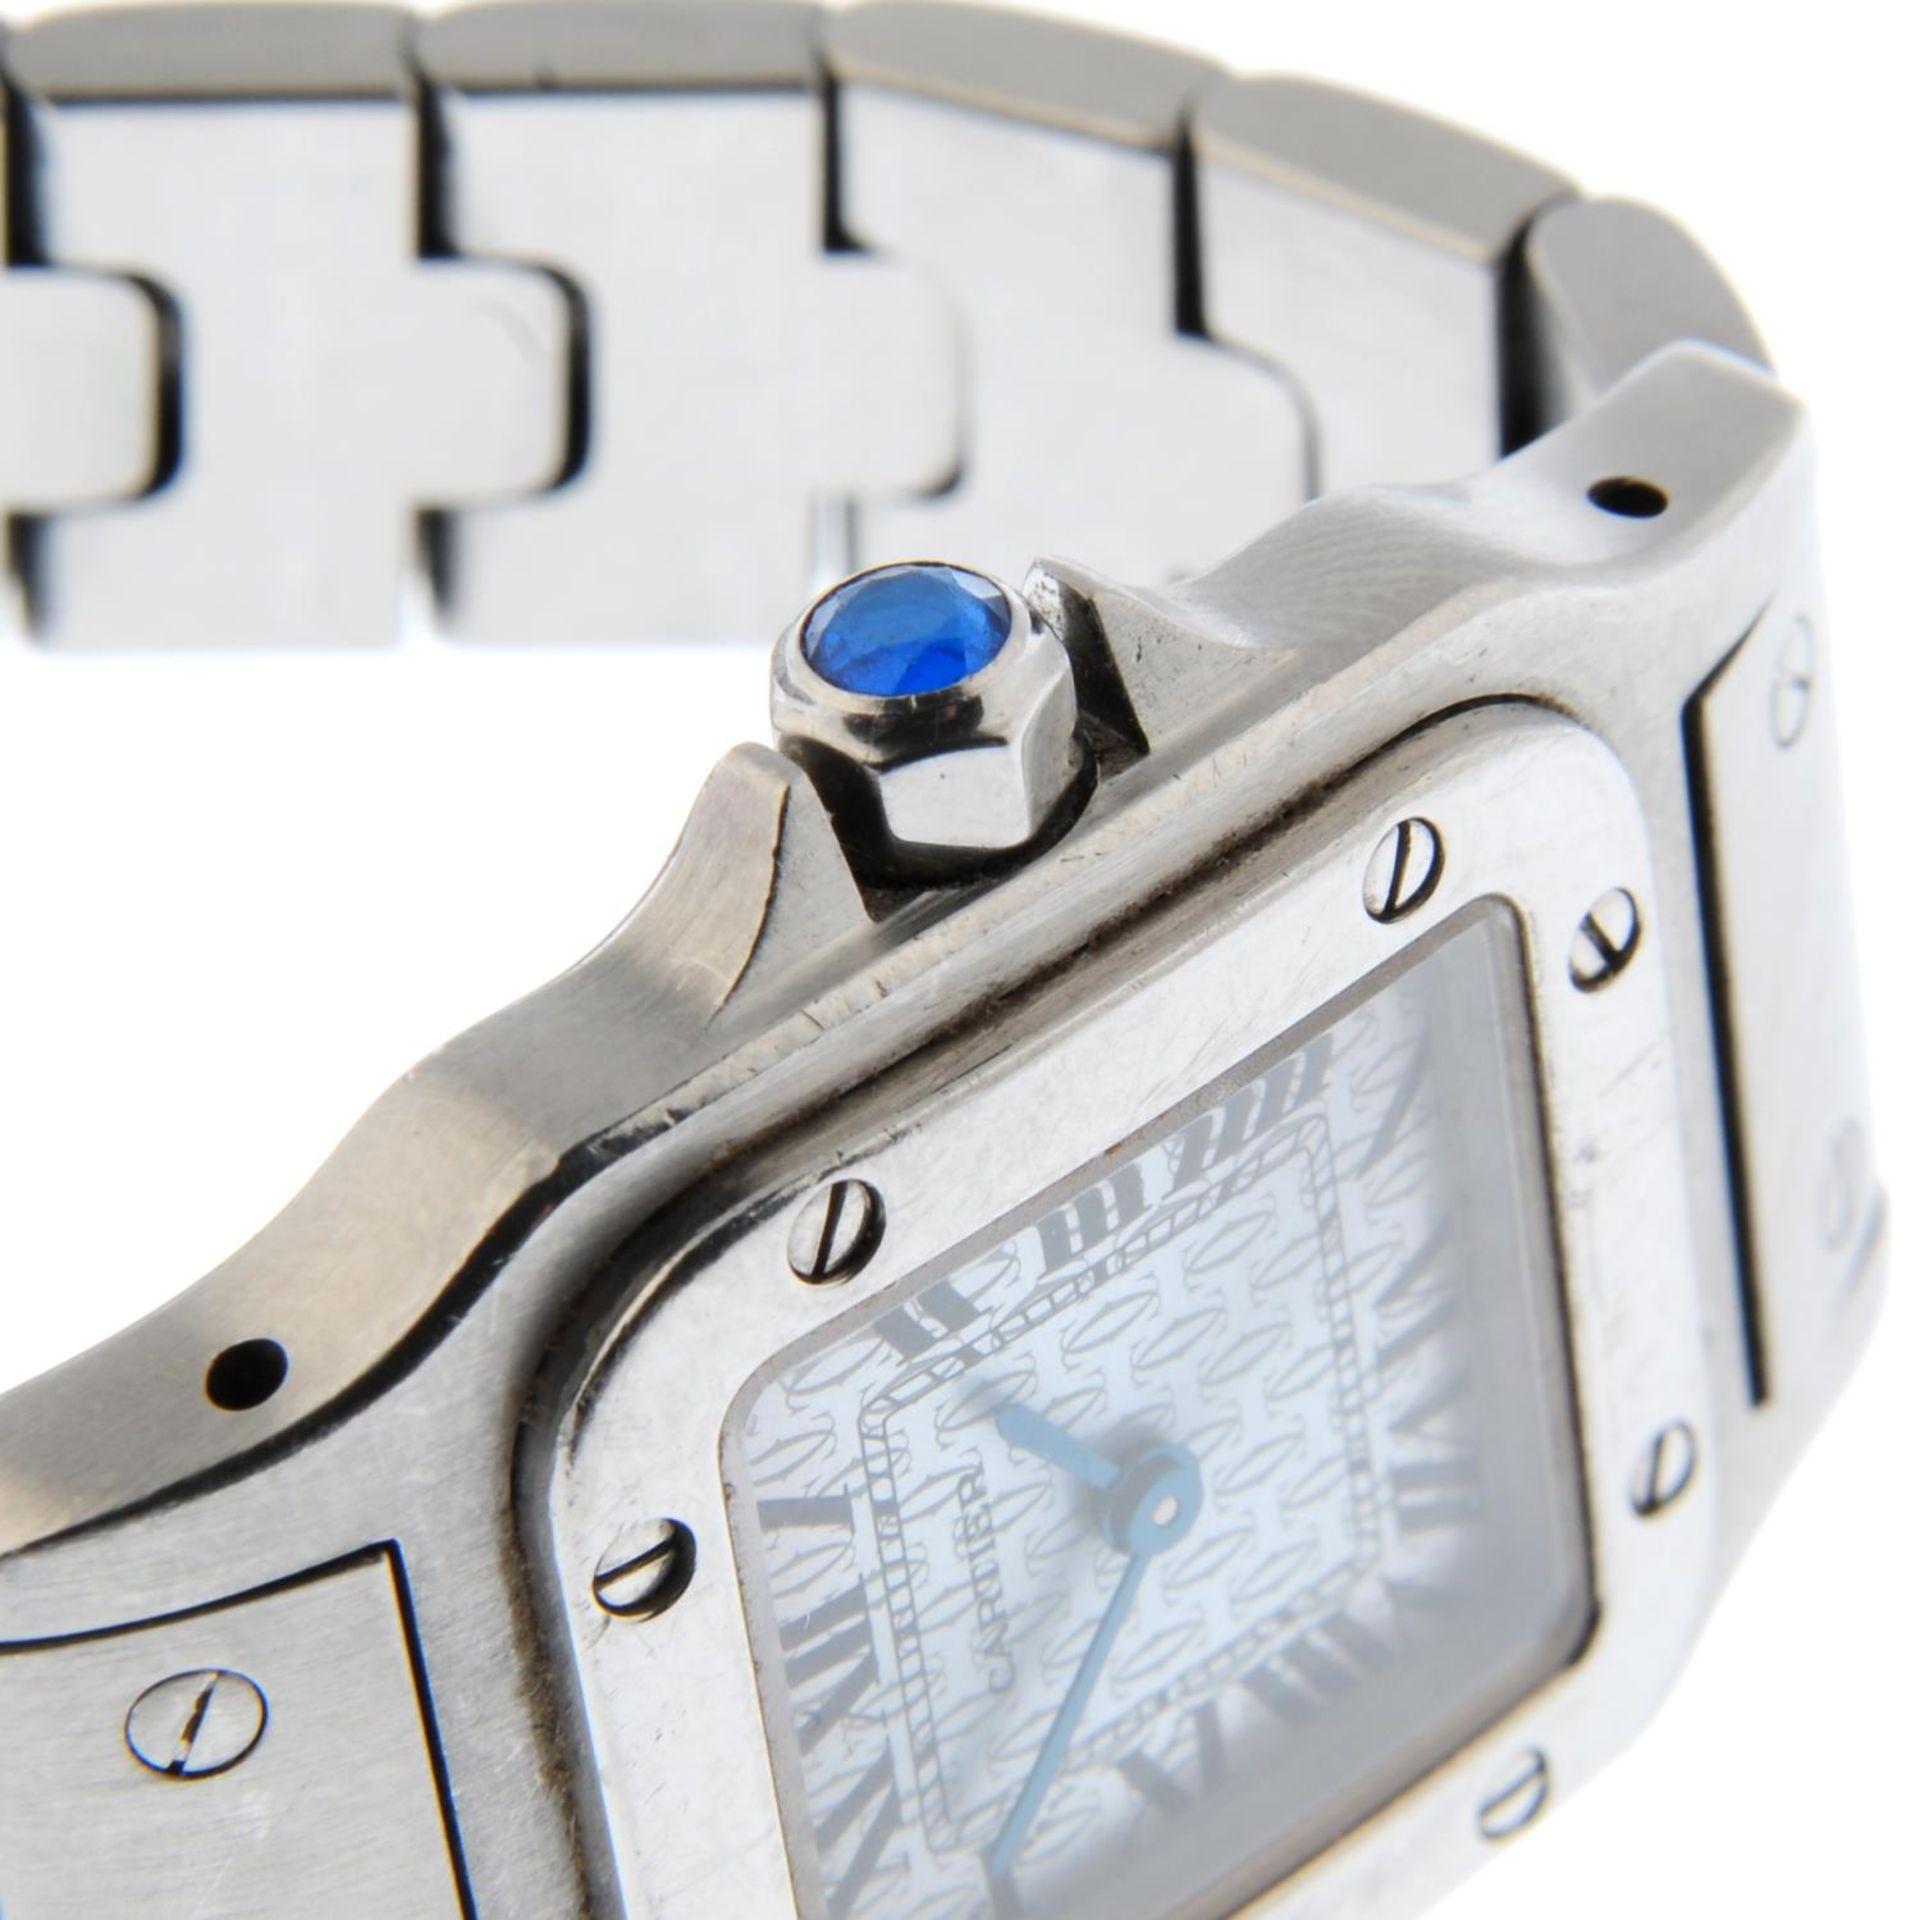 CARTIER - a Santos bracelet watch. - Bild 5 aus 5